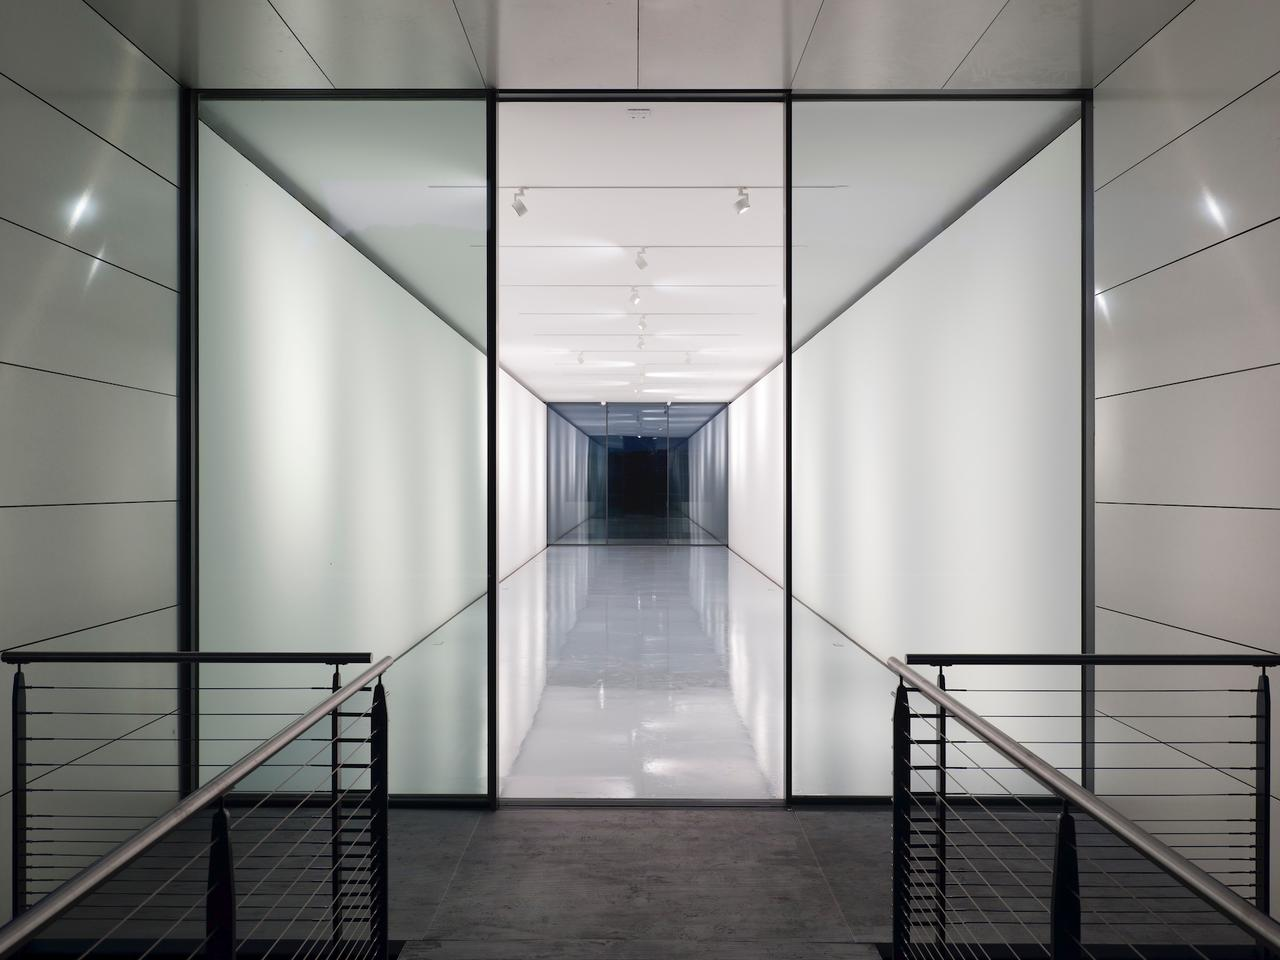 Richard Rogers의 드로잉 갤러리의 내부는 120 제곱미터 (약 1,290 제곱 피트)이며 직사각형 방 하나 (외부 테라스 공간 포함)로 구성됩니다.